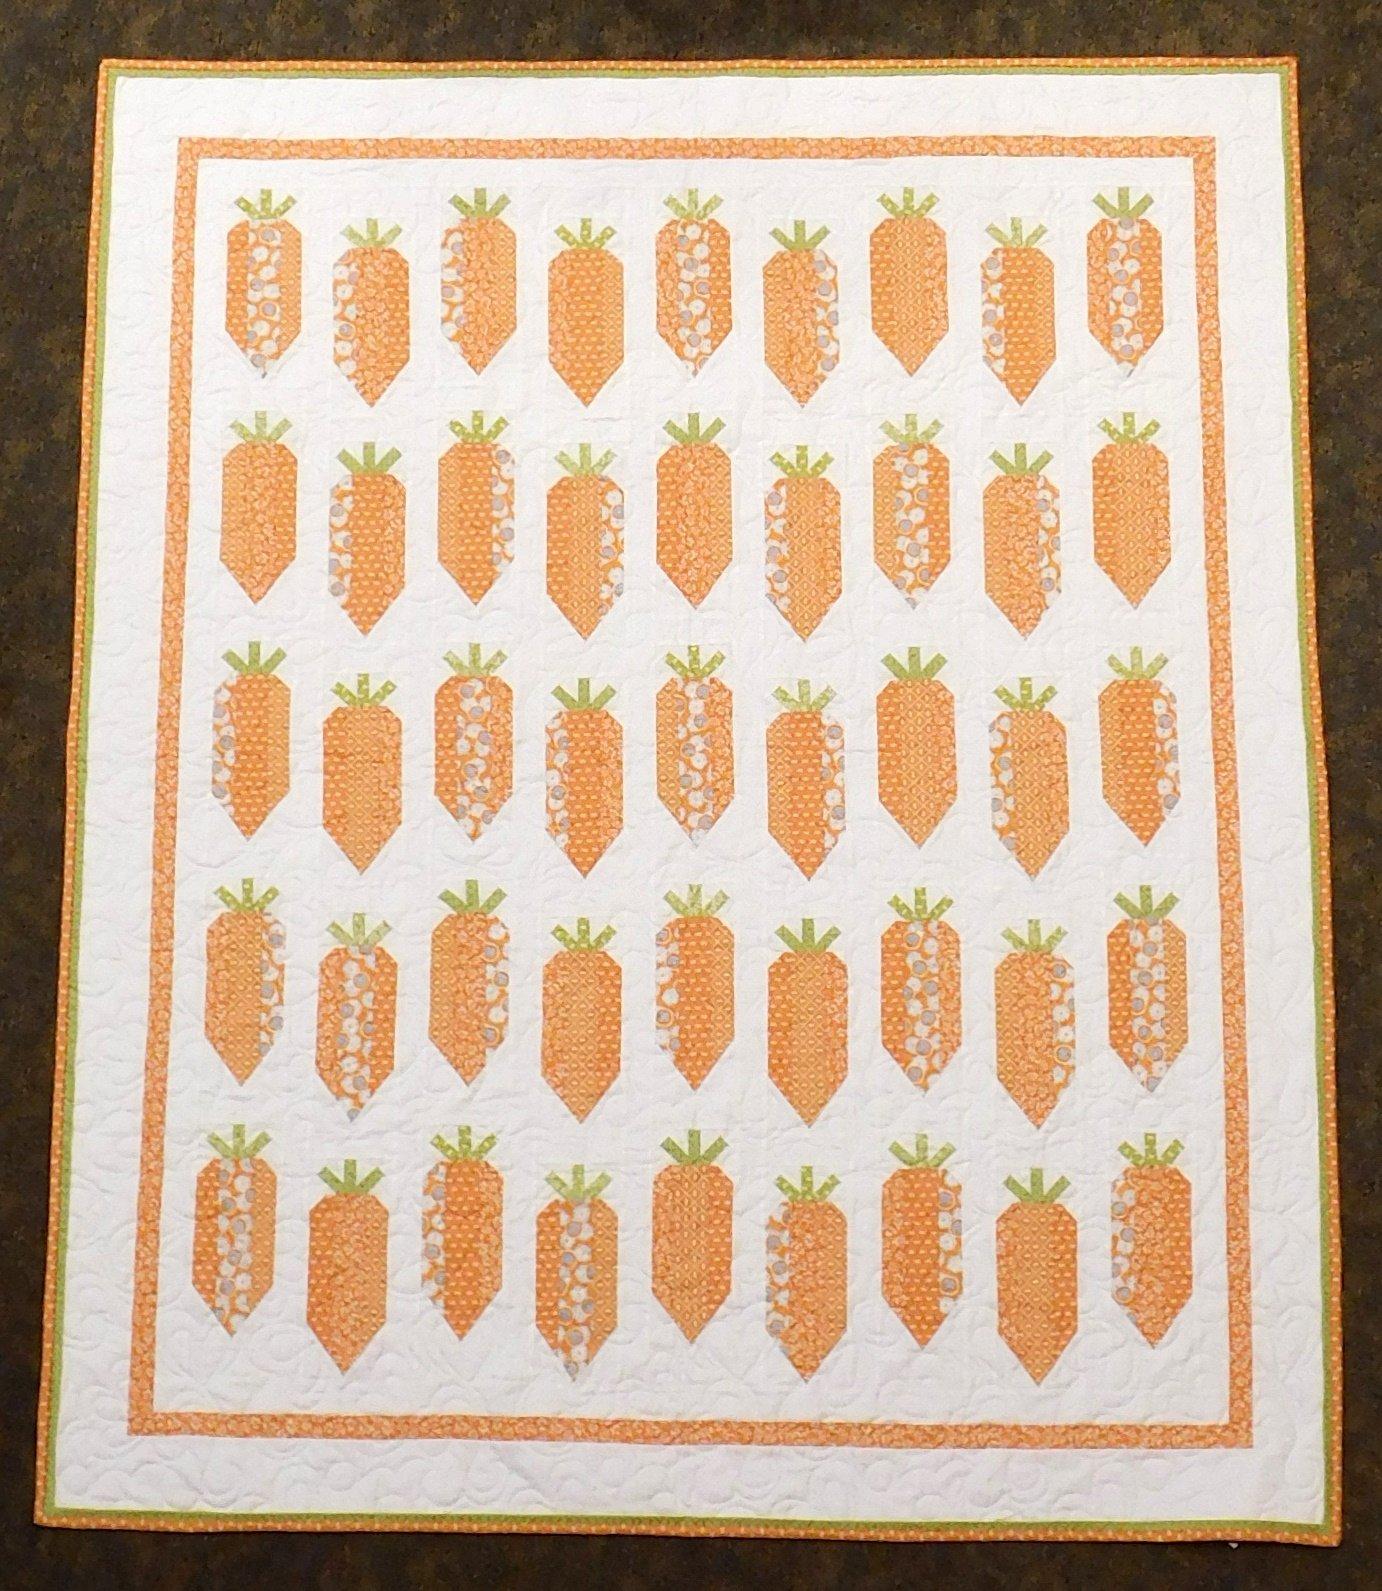 Carrot sticks Quilt Kit 56 x 67 1/2